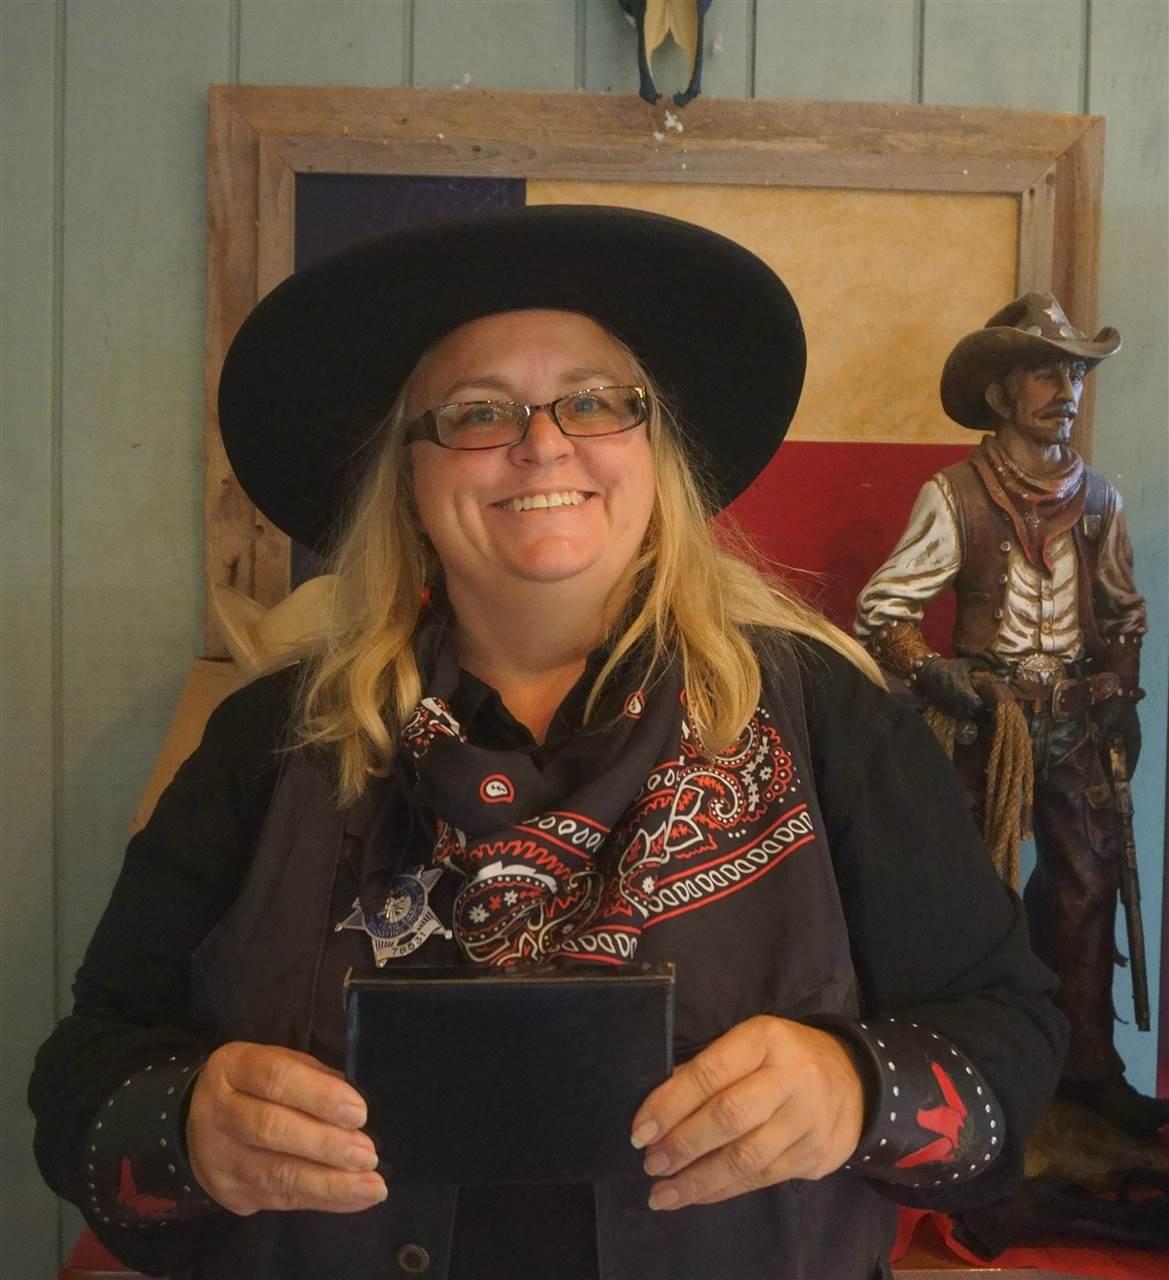 _Classic Cowgirl - Hot Tamale